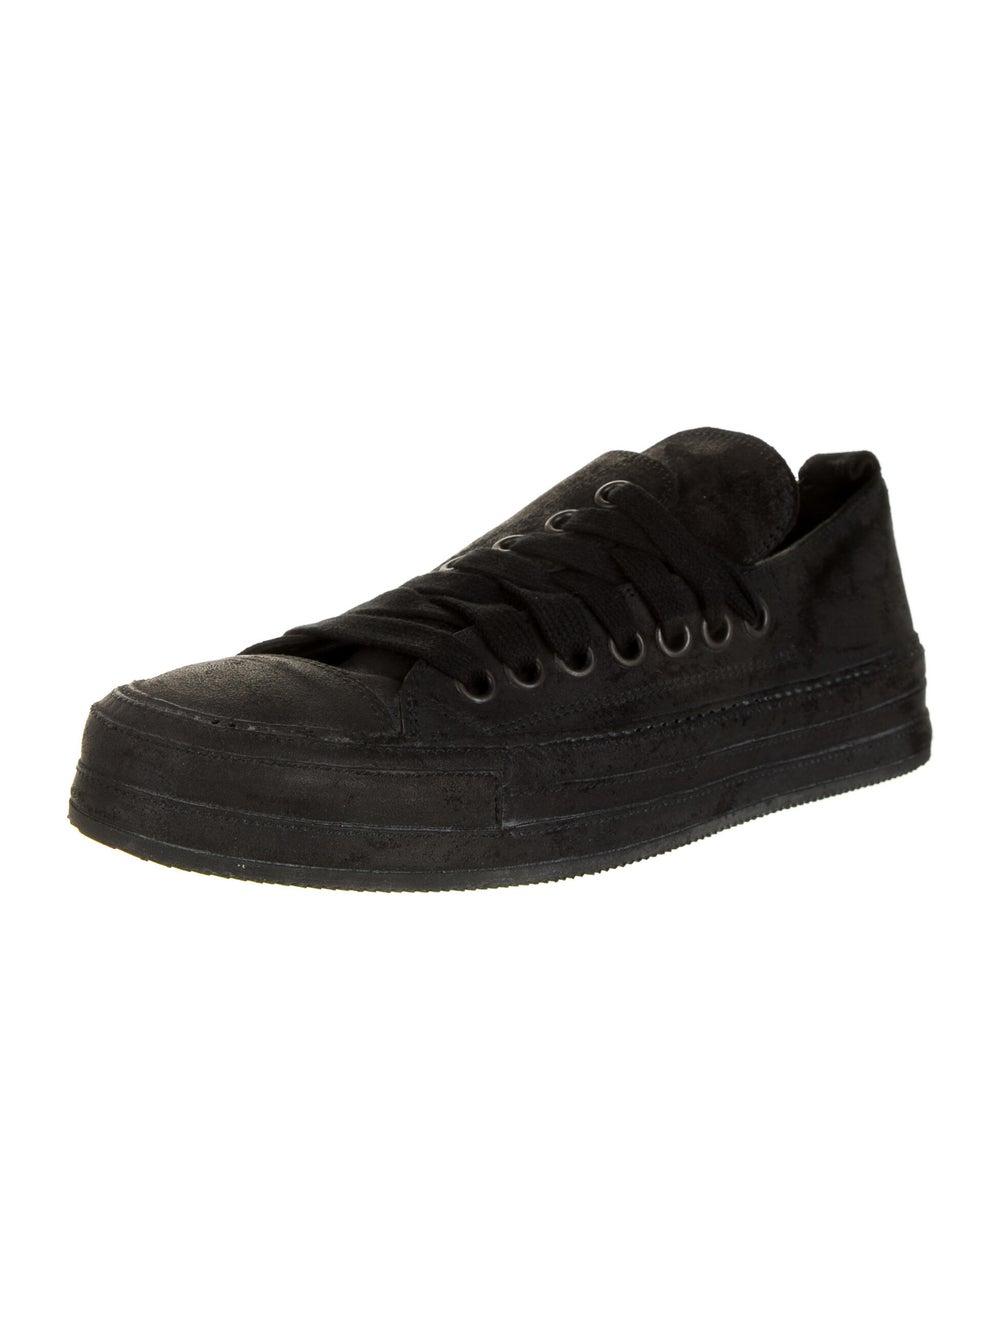 Ann Demeulemeester Suede Sneakers Black - image 2